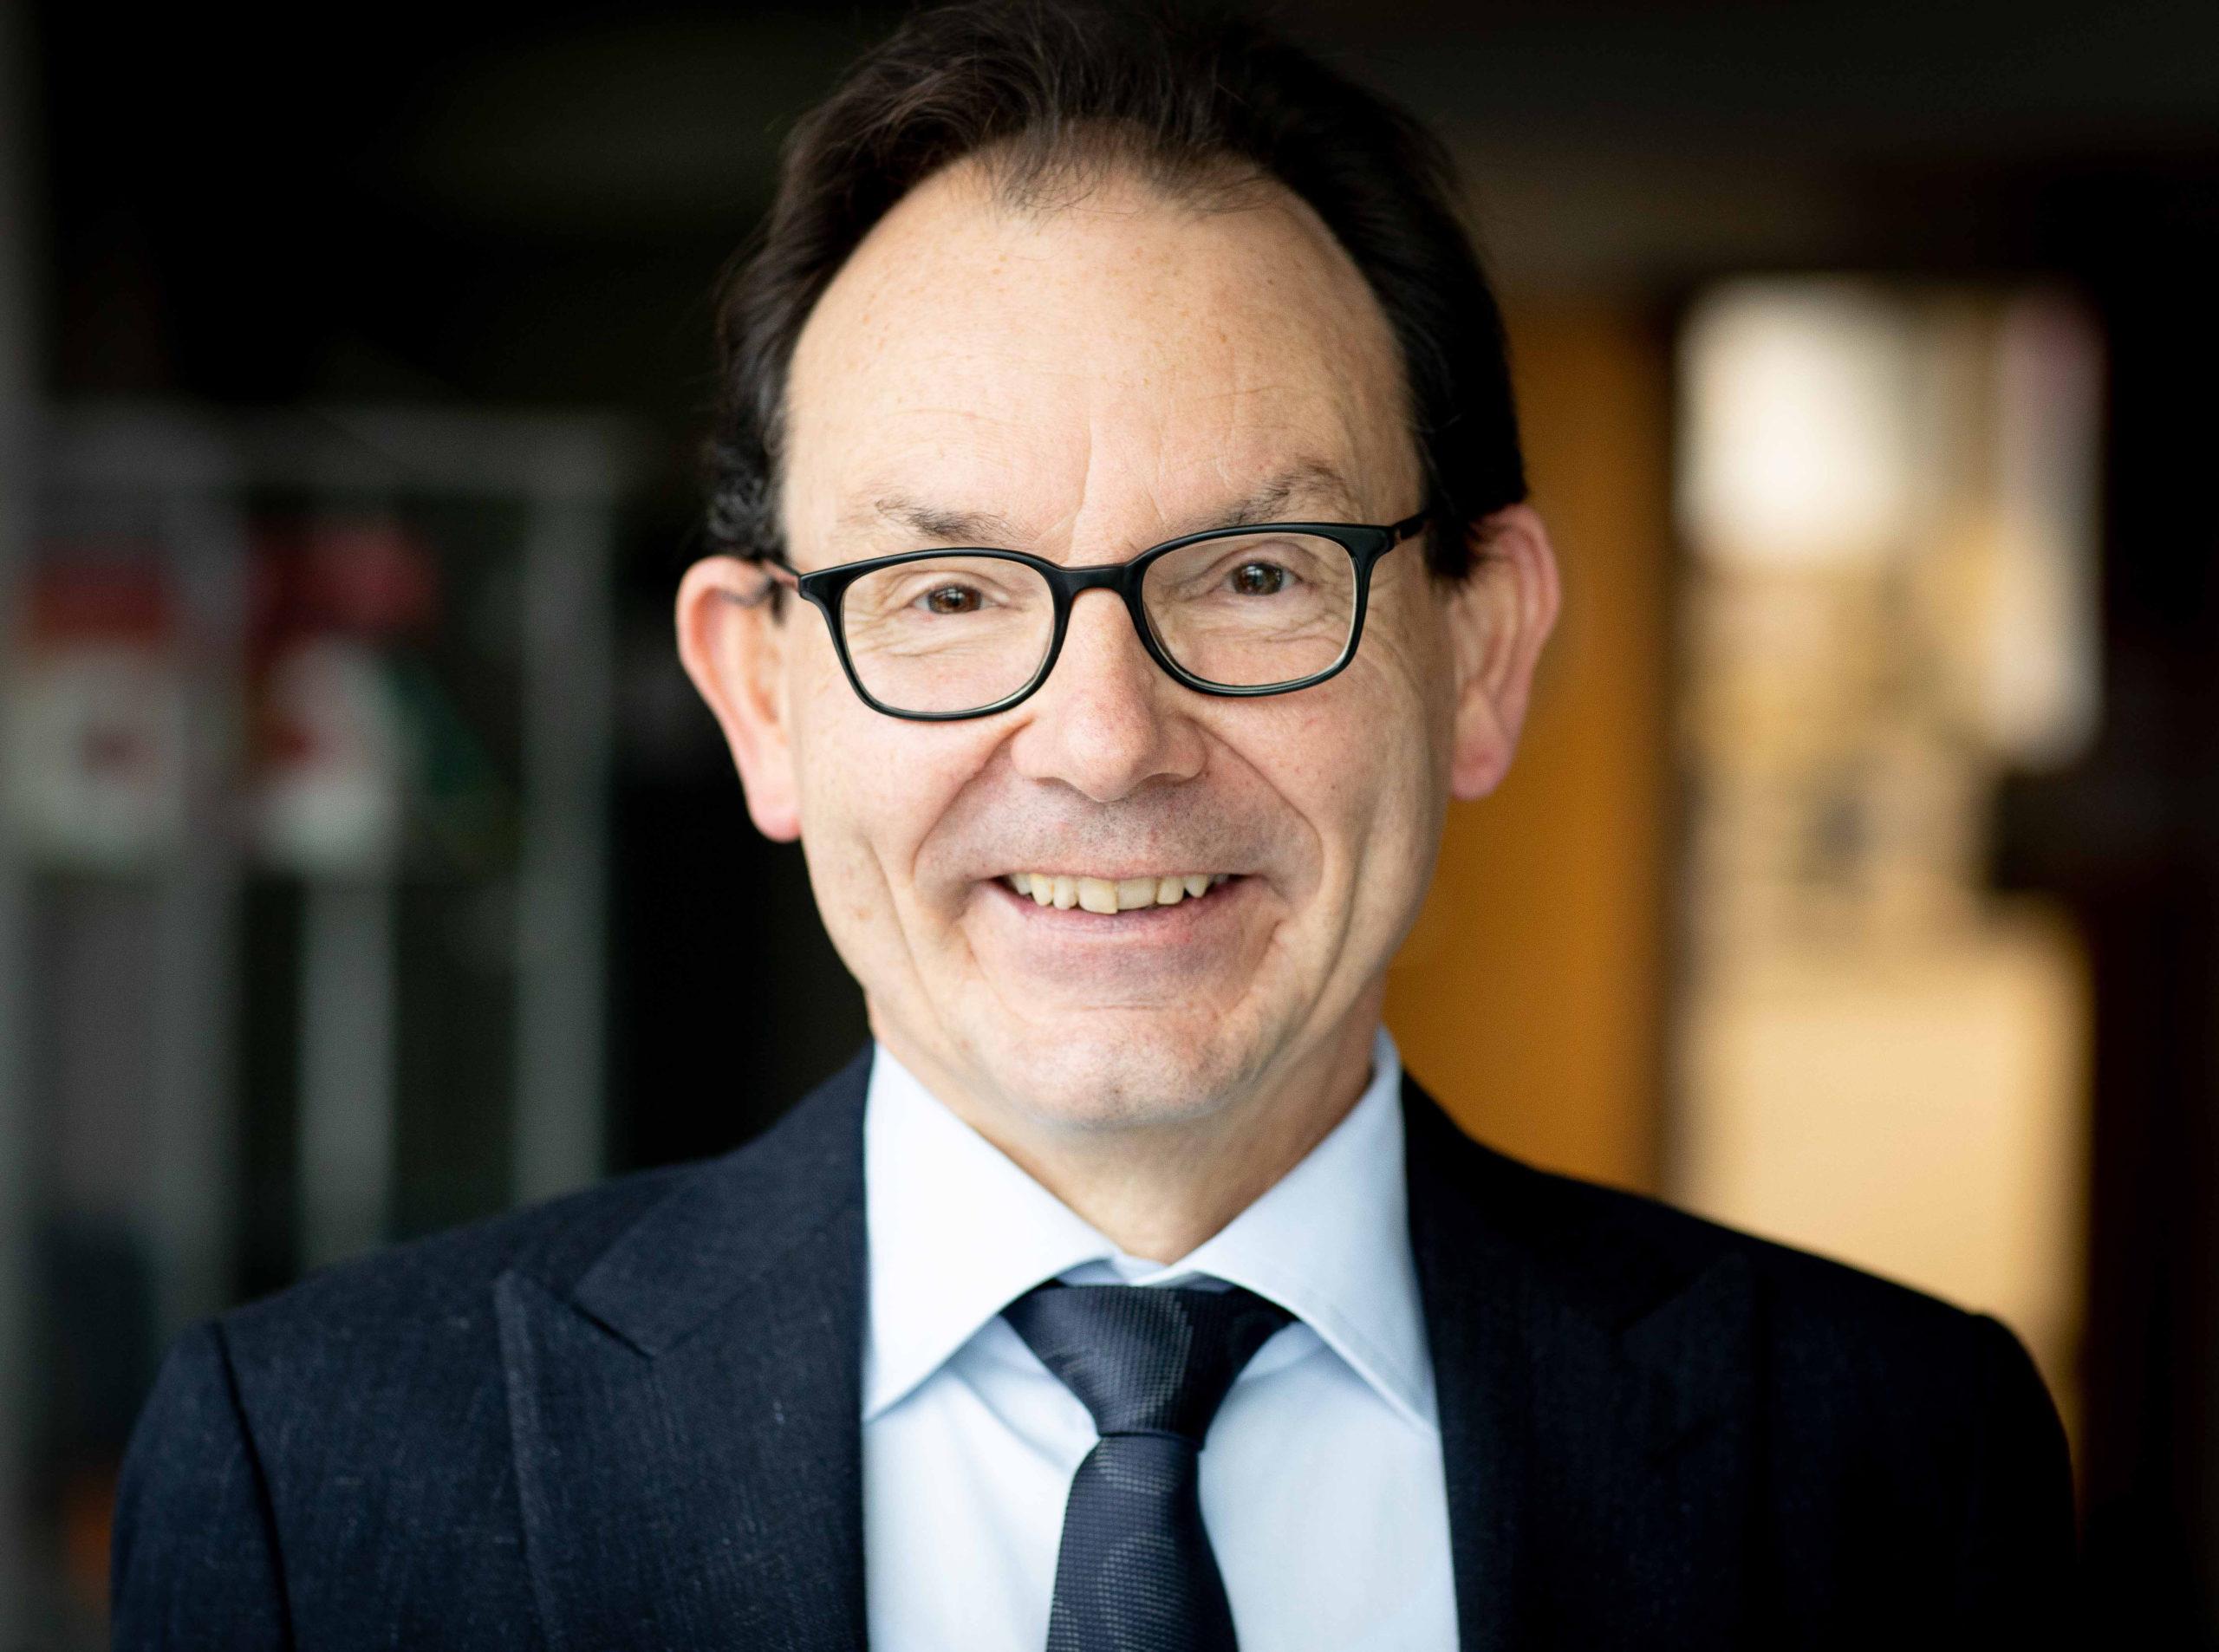 Prof. Dr.-Ing. Volker Altstädt | Polymer Engineering Bayreuth